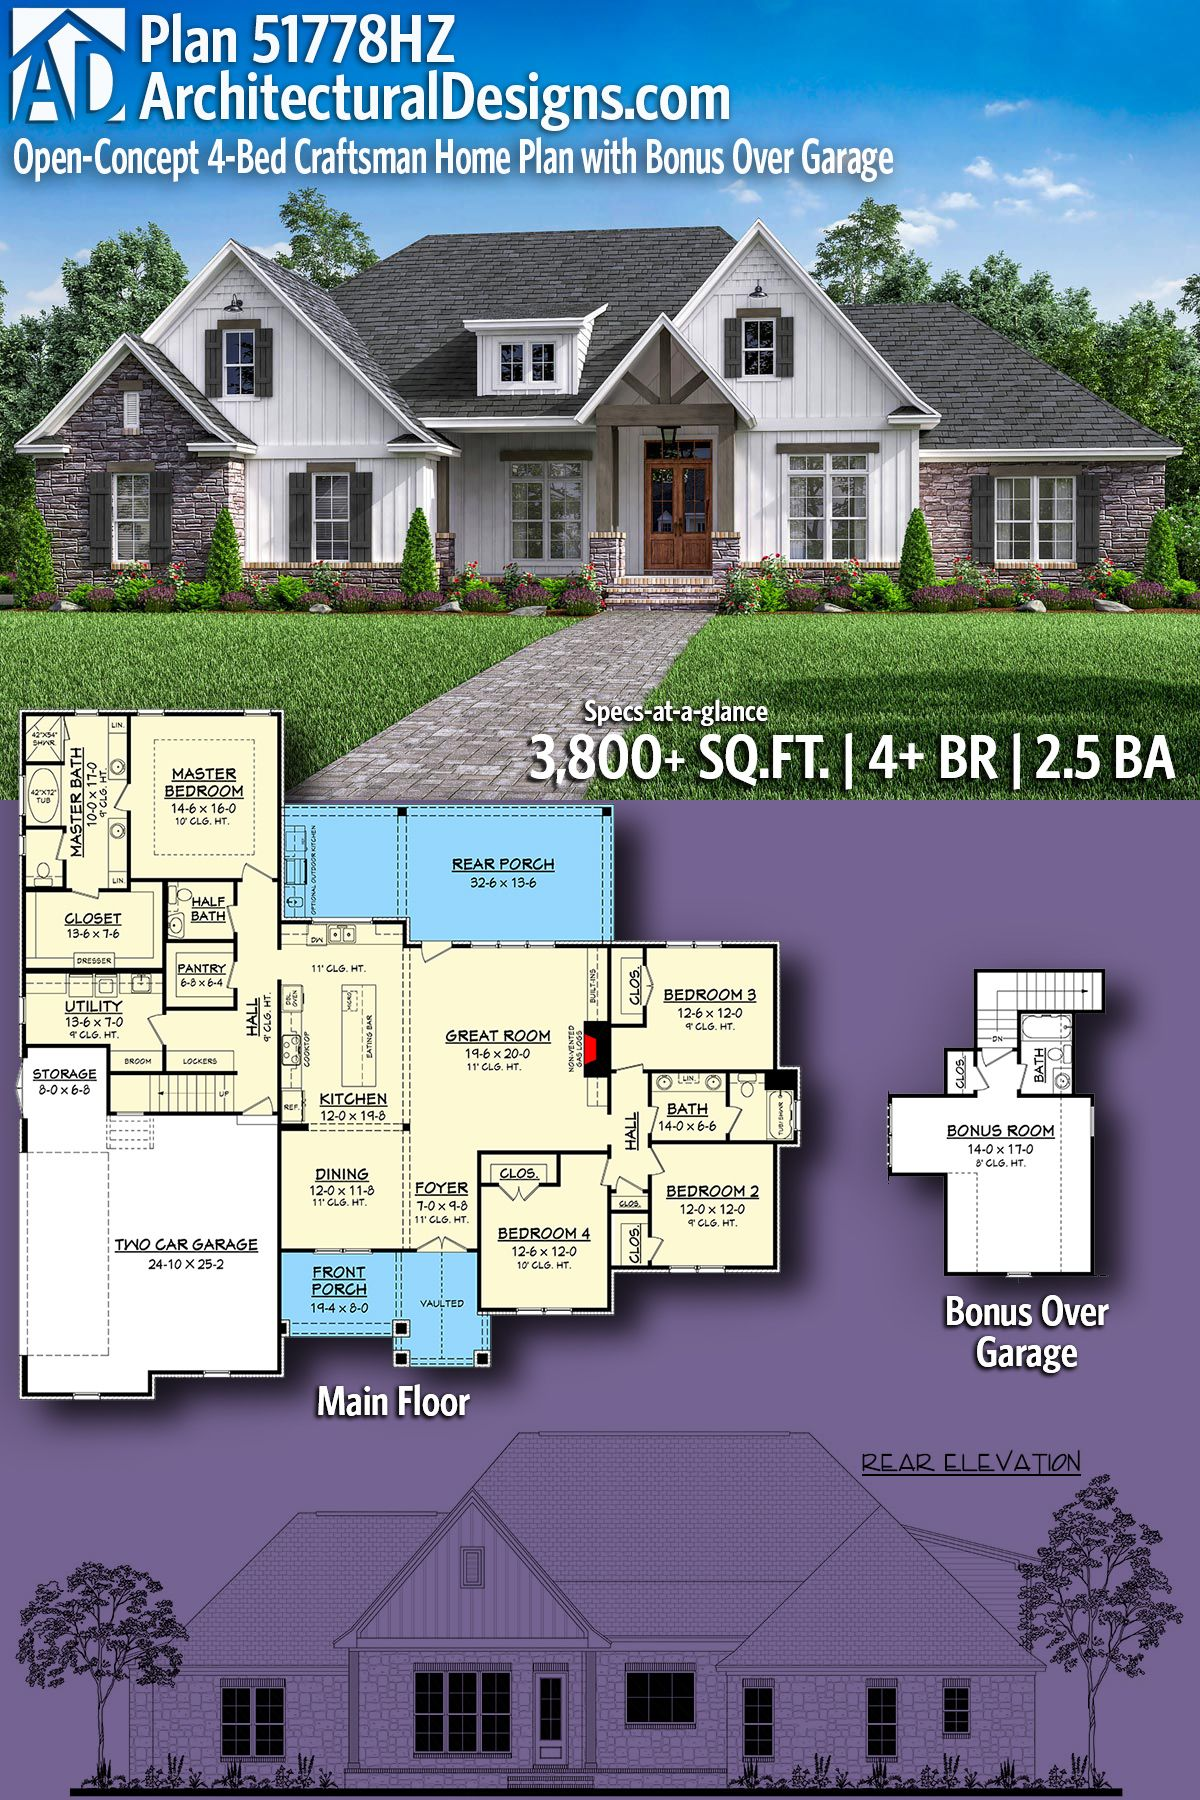 Plan hz openconcept bed craftsman home plan with bonus over